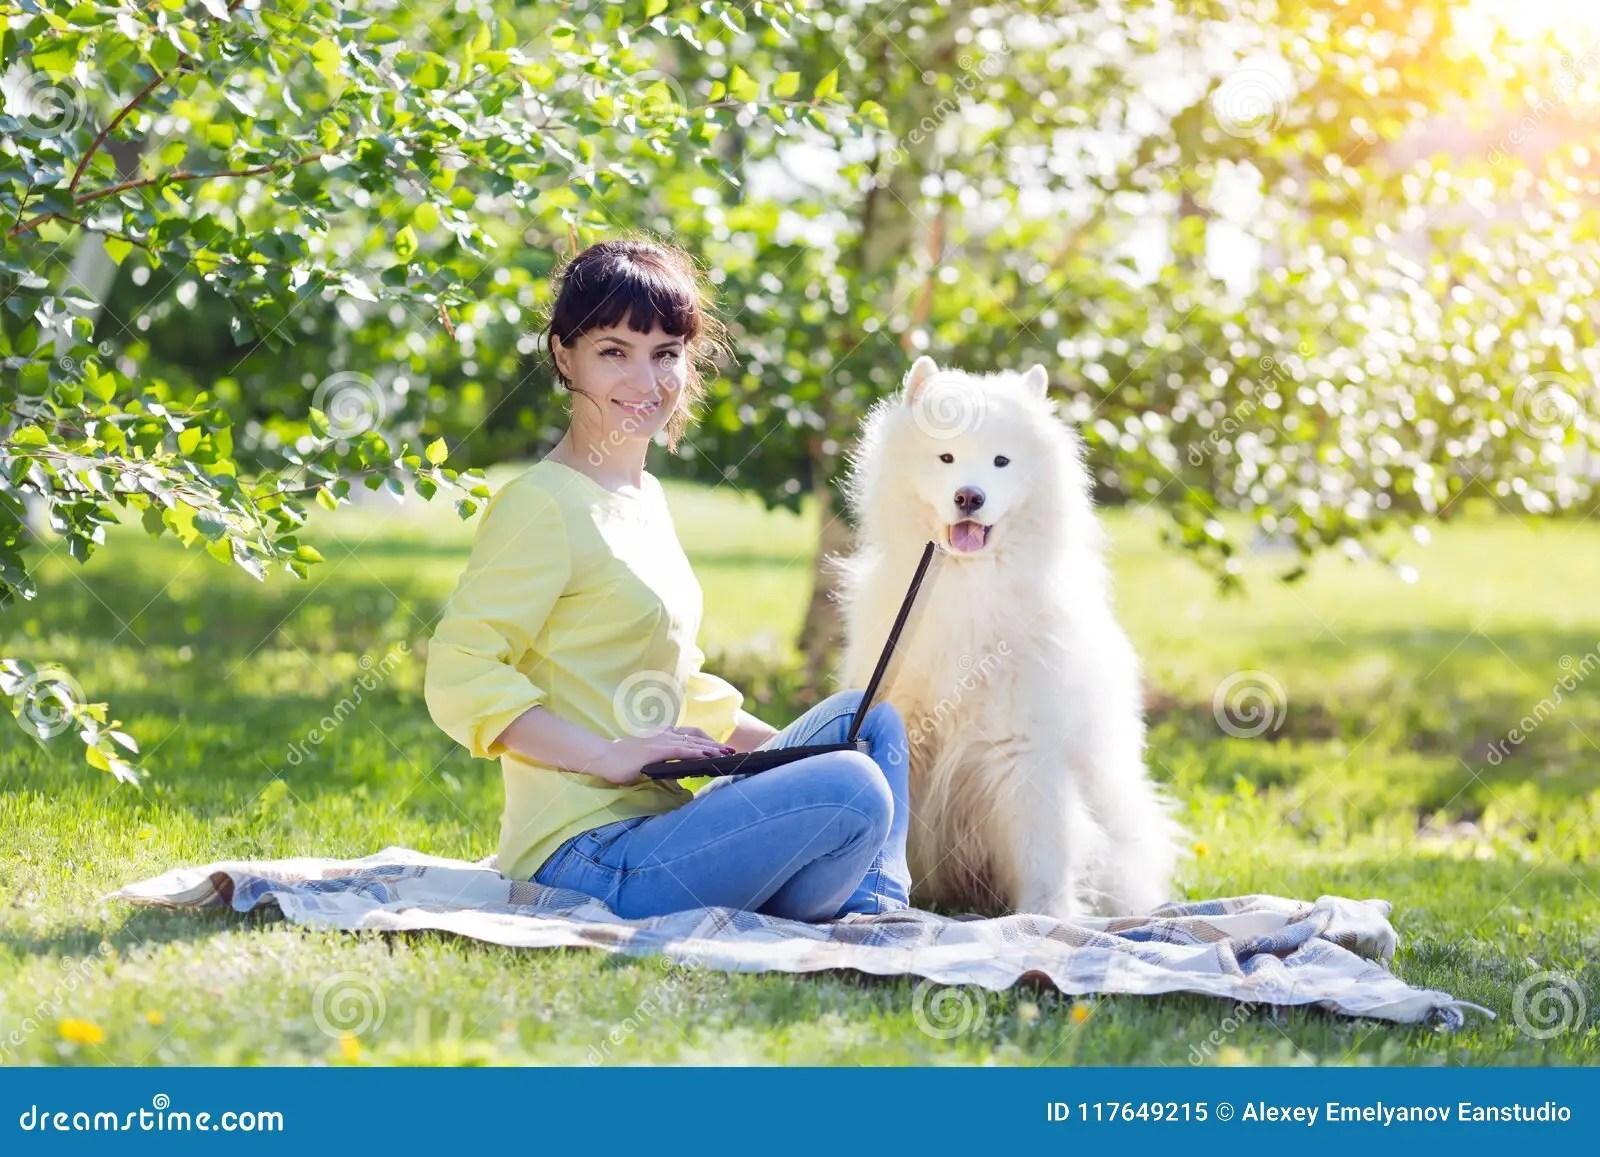 Girl Freelancer With A Big White Dog